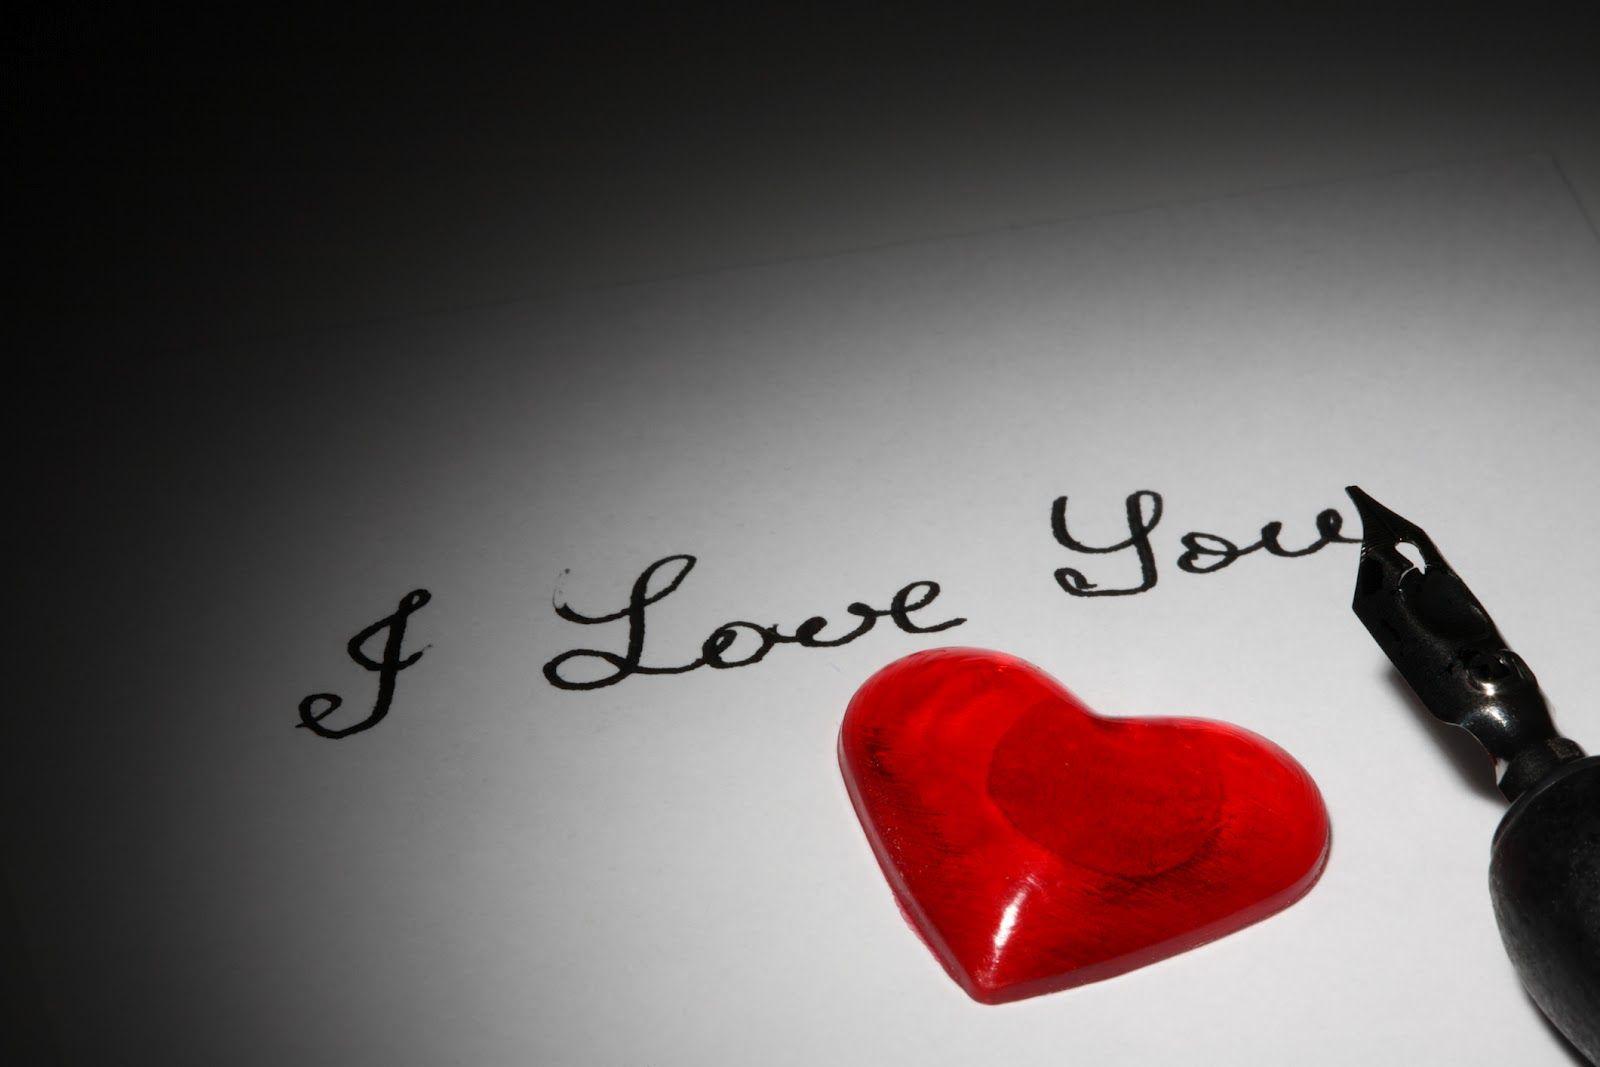 Hd wallpaper i love you - I Love You Wallpaper Hd 4 Hd Wallpapers Download Wallpaper